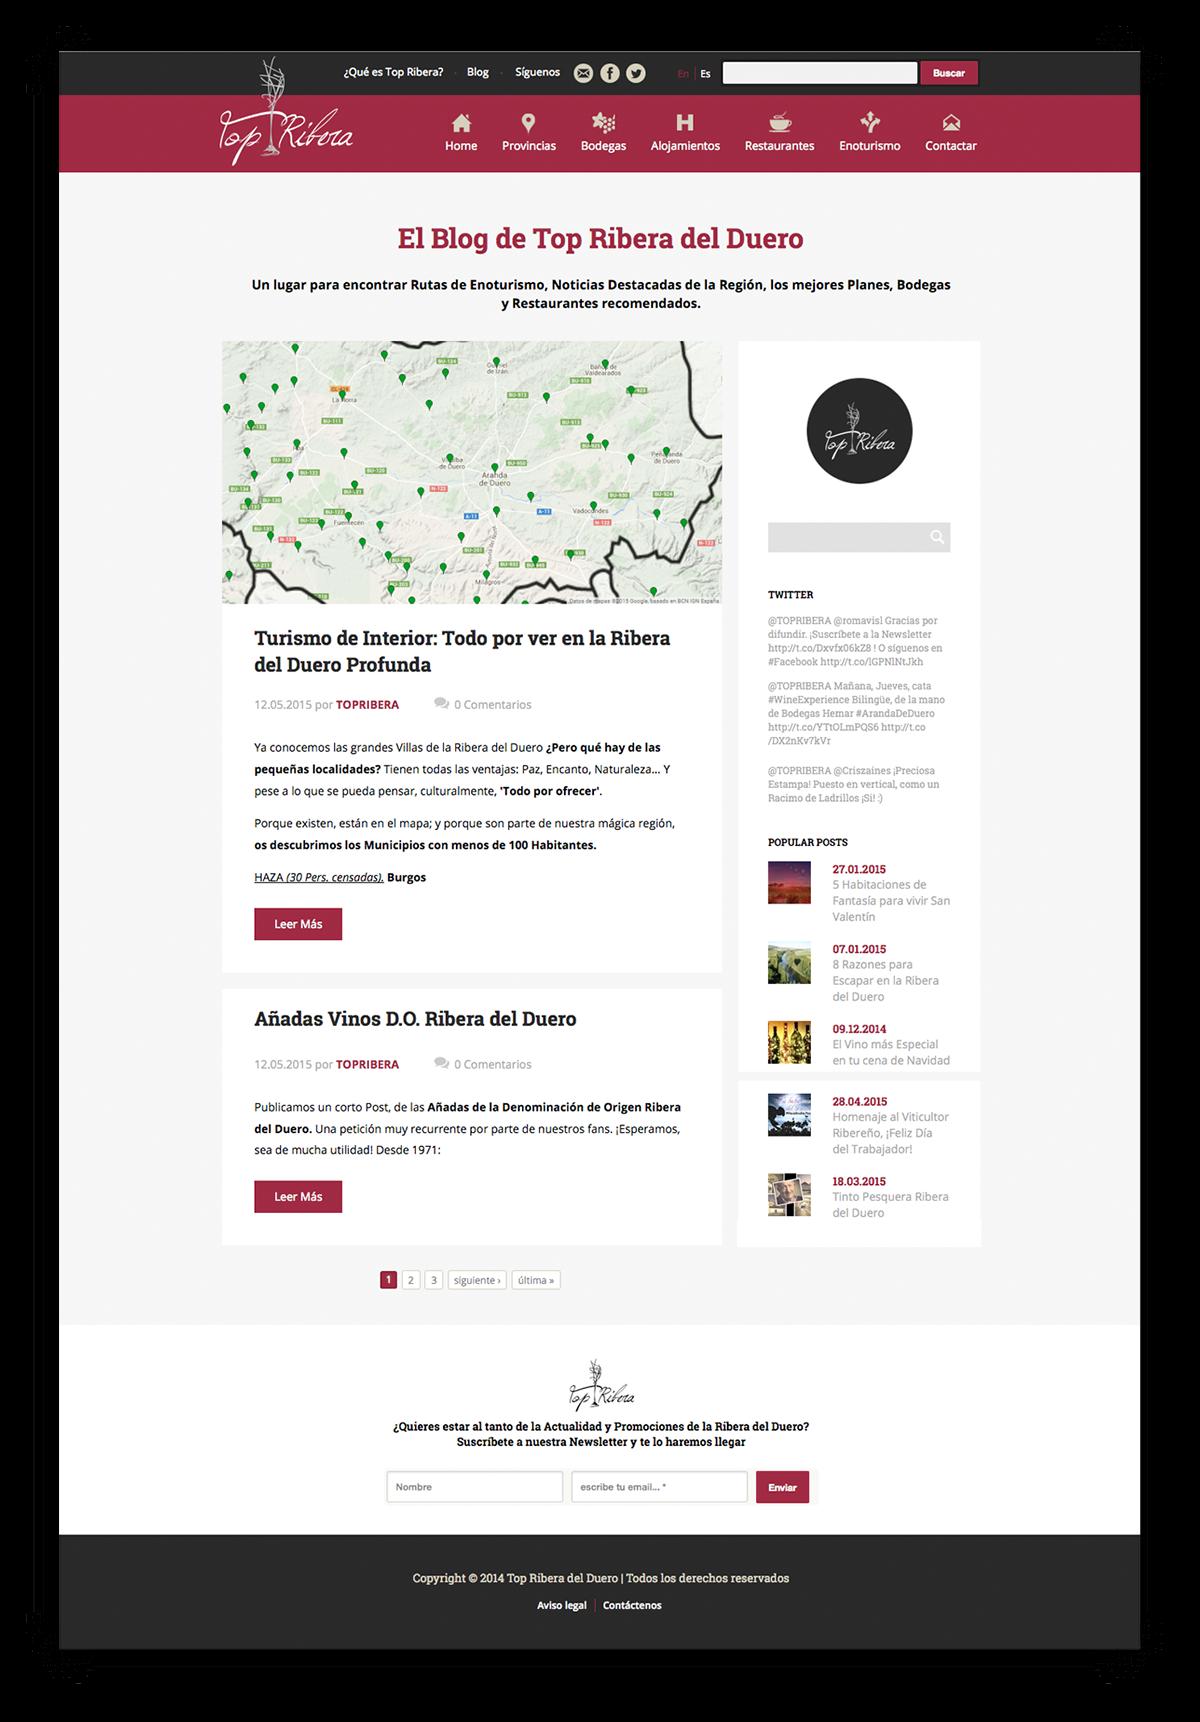 Adobe Portfolio Web design topribera Webdesign topriberadelduero bodegas UI ux